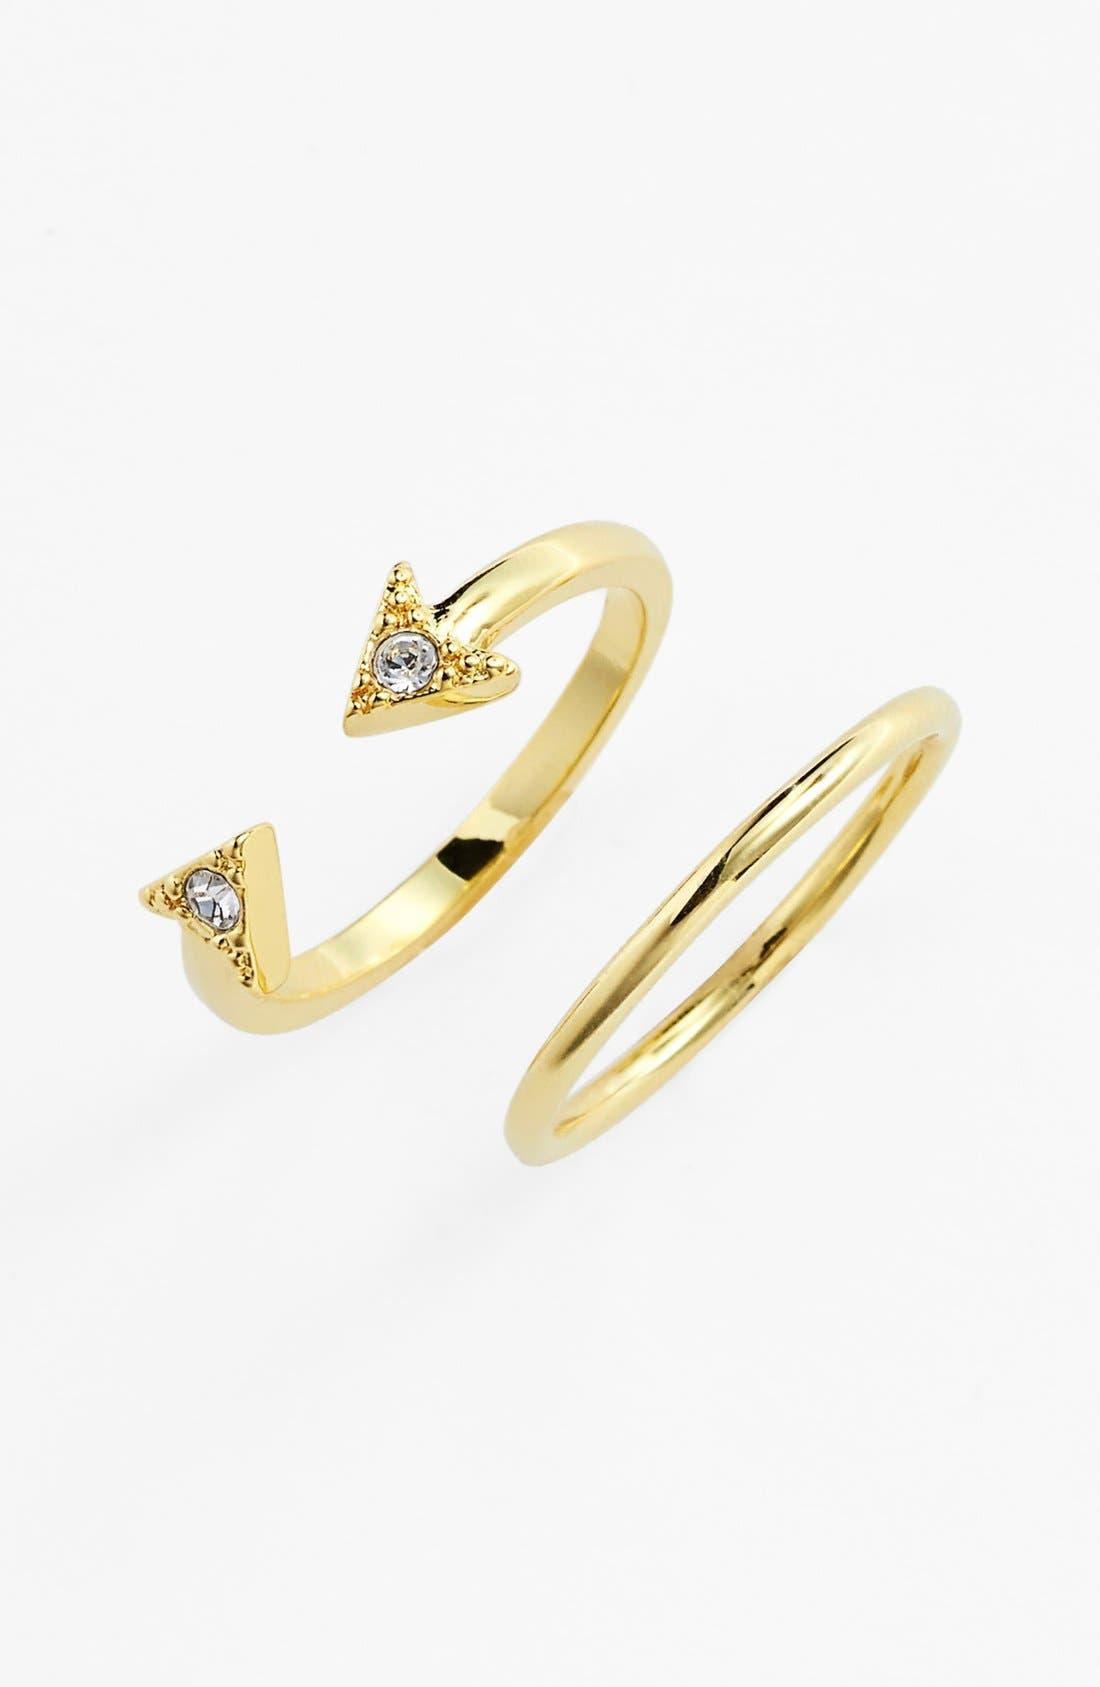 Main Image - Ariella Collection Arrow Midi Rings (Set of 2)